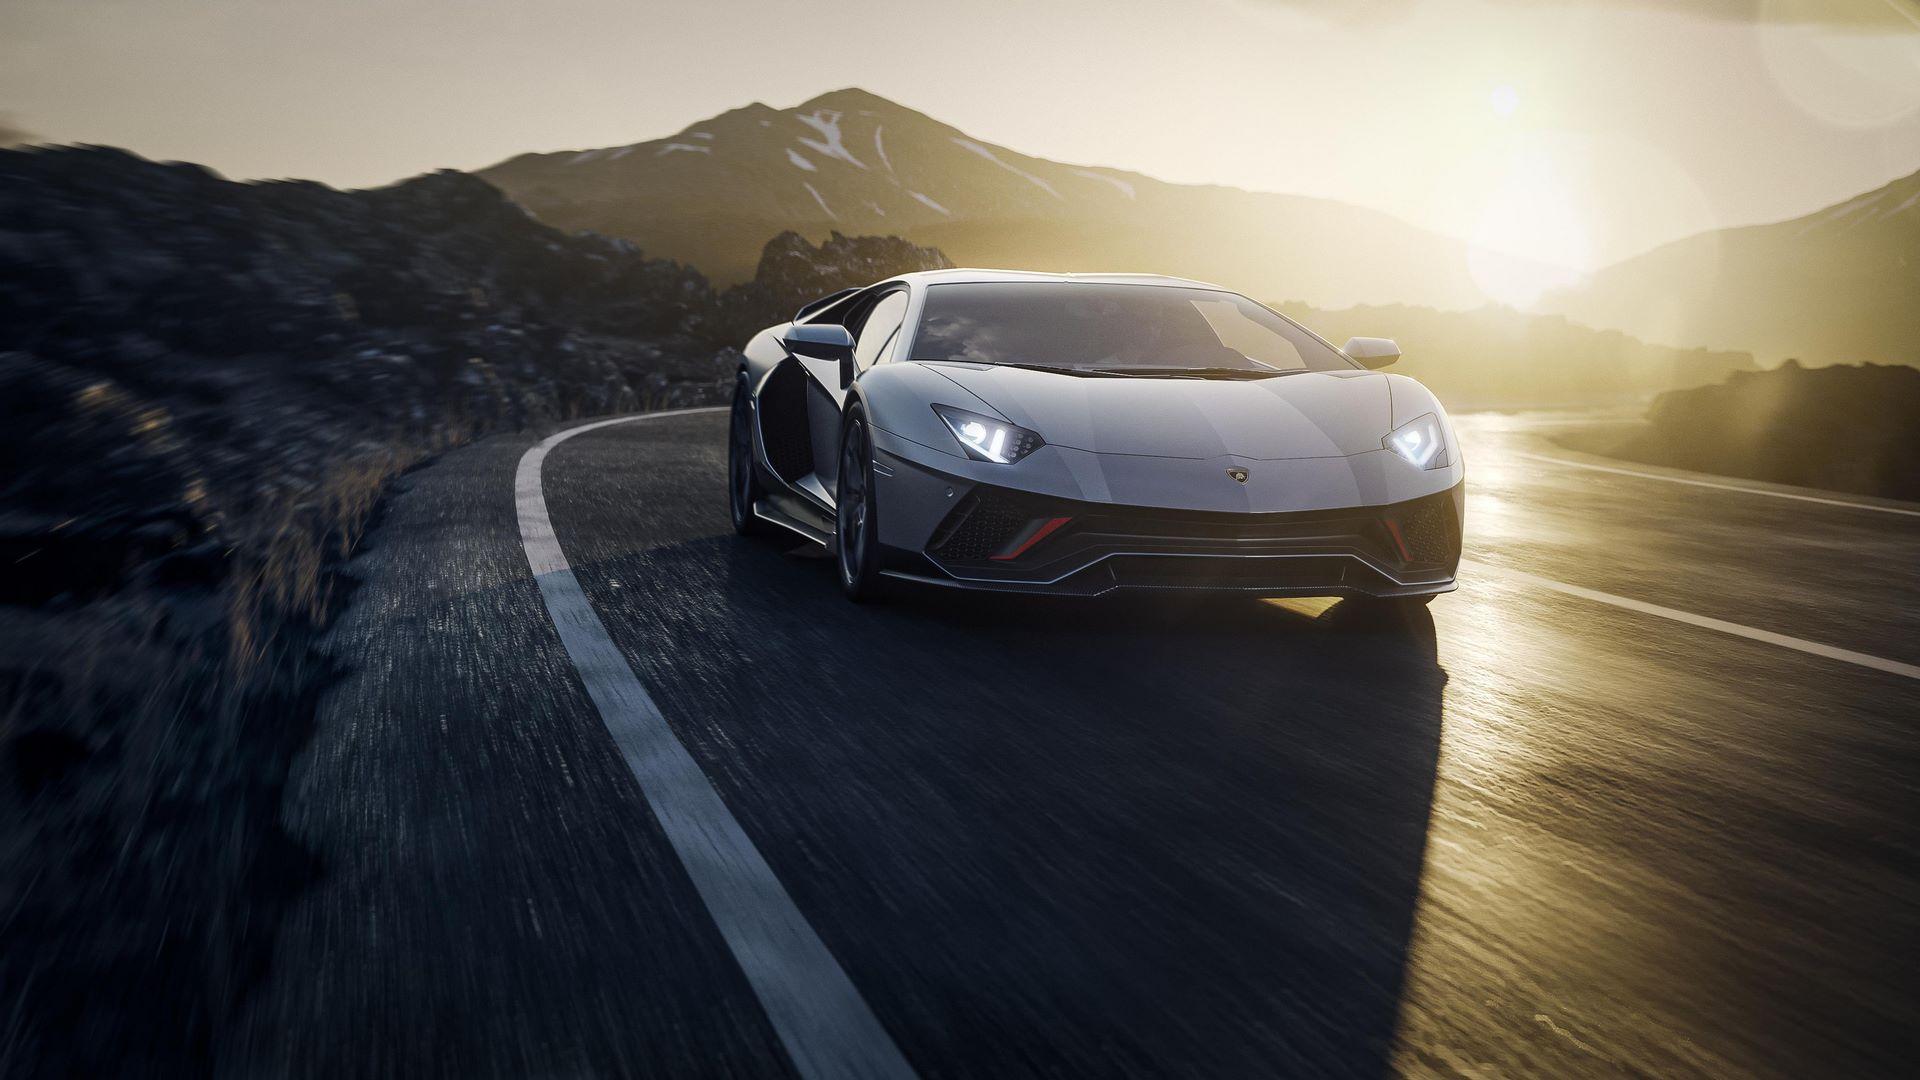 Lamborghini-Aventador-LP780-4-Ultimae-3